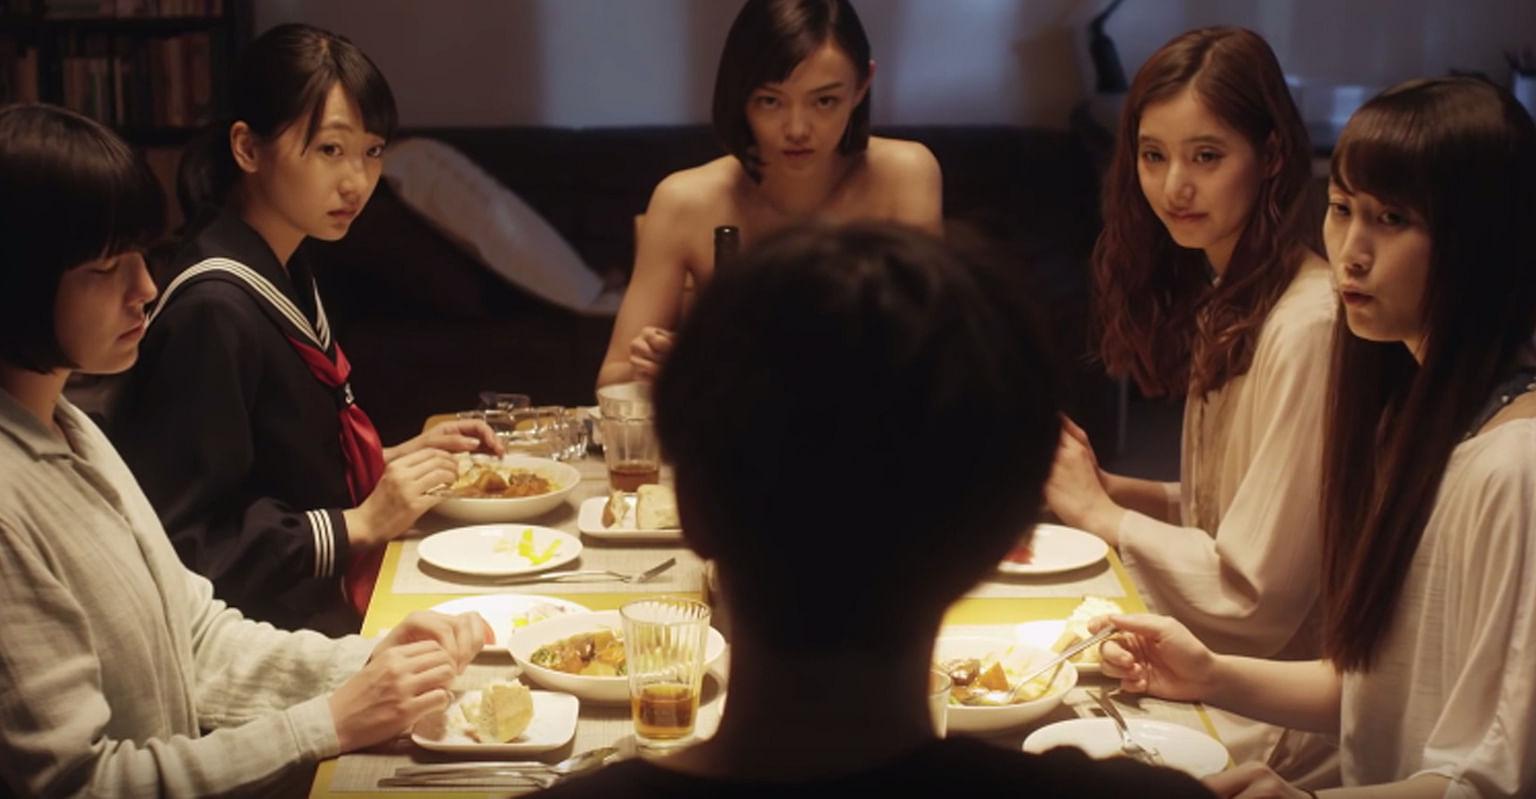 TV review: Netflix's Million Yen Women easy to watch, hard